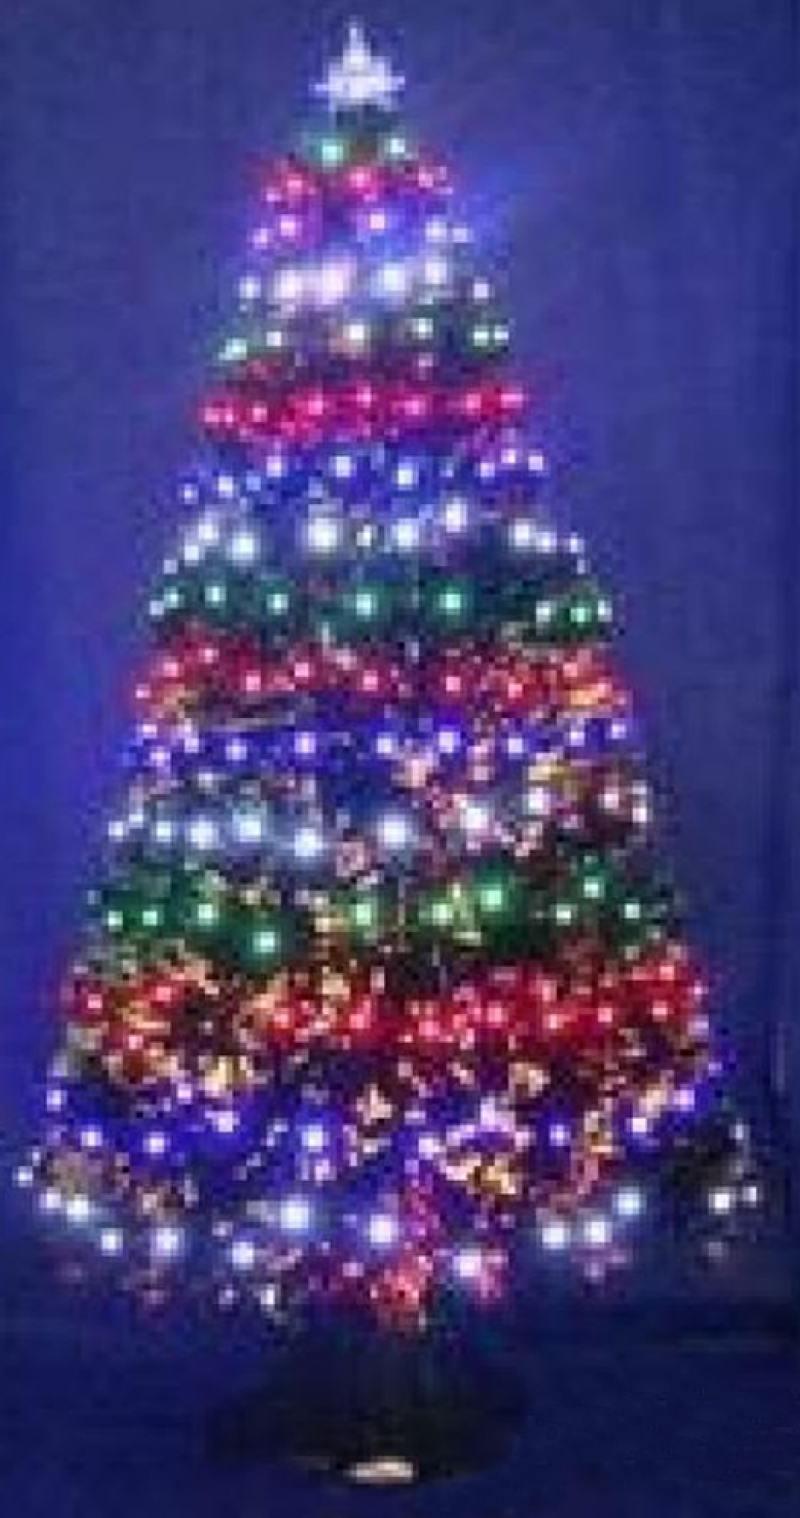 Ель Winter Wings N04127 90 см световод с разноцветными супер-яркими лампами, 100 ламп LED,100 веток, ель winter wings n04127 90 см световод с разноцветными супер яркими лампами 100 ламп led 100 веток